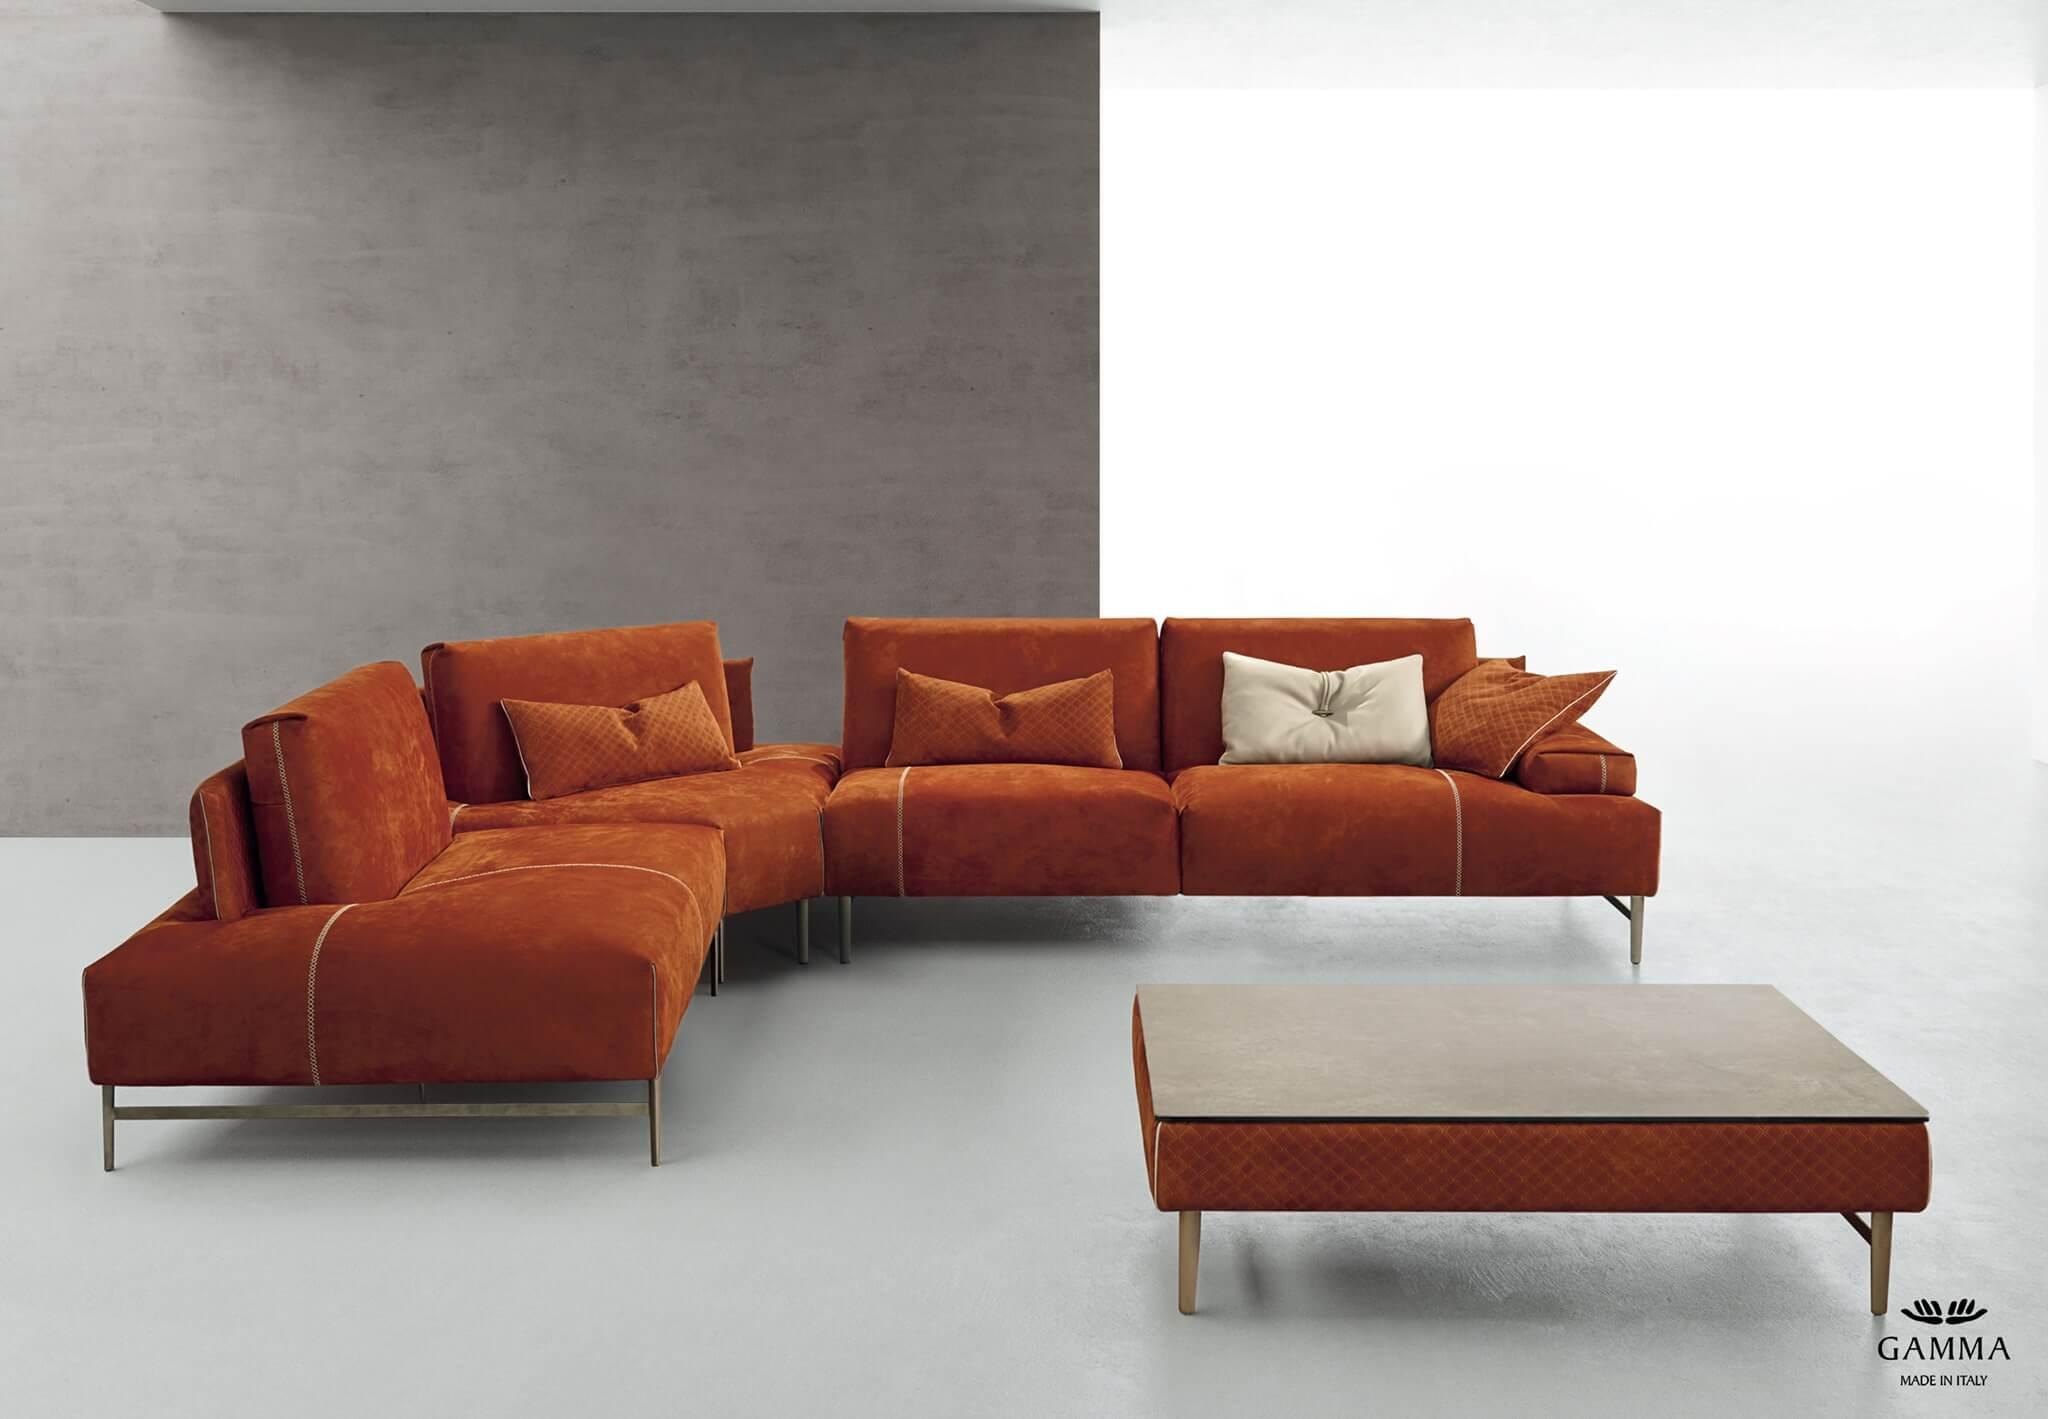 GAMMA義大利設計沙發